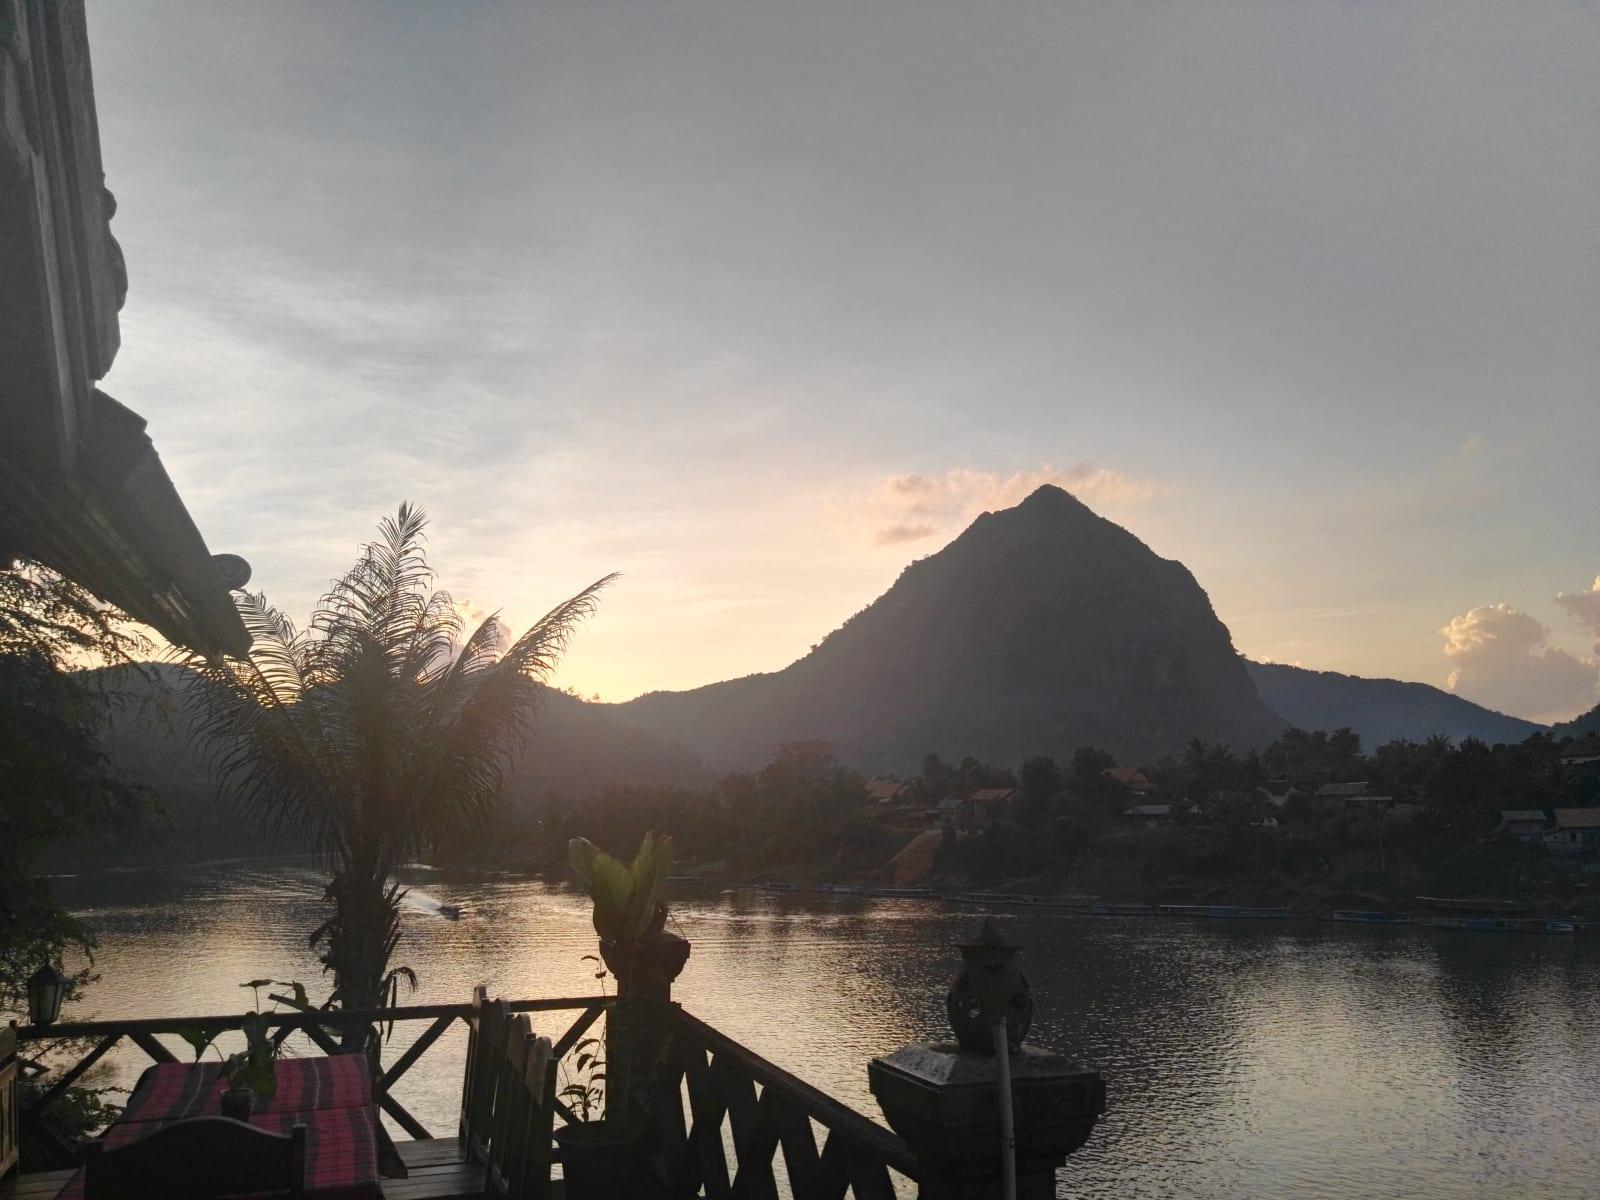 Východ slunce, Nong Khiaw, Laos